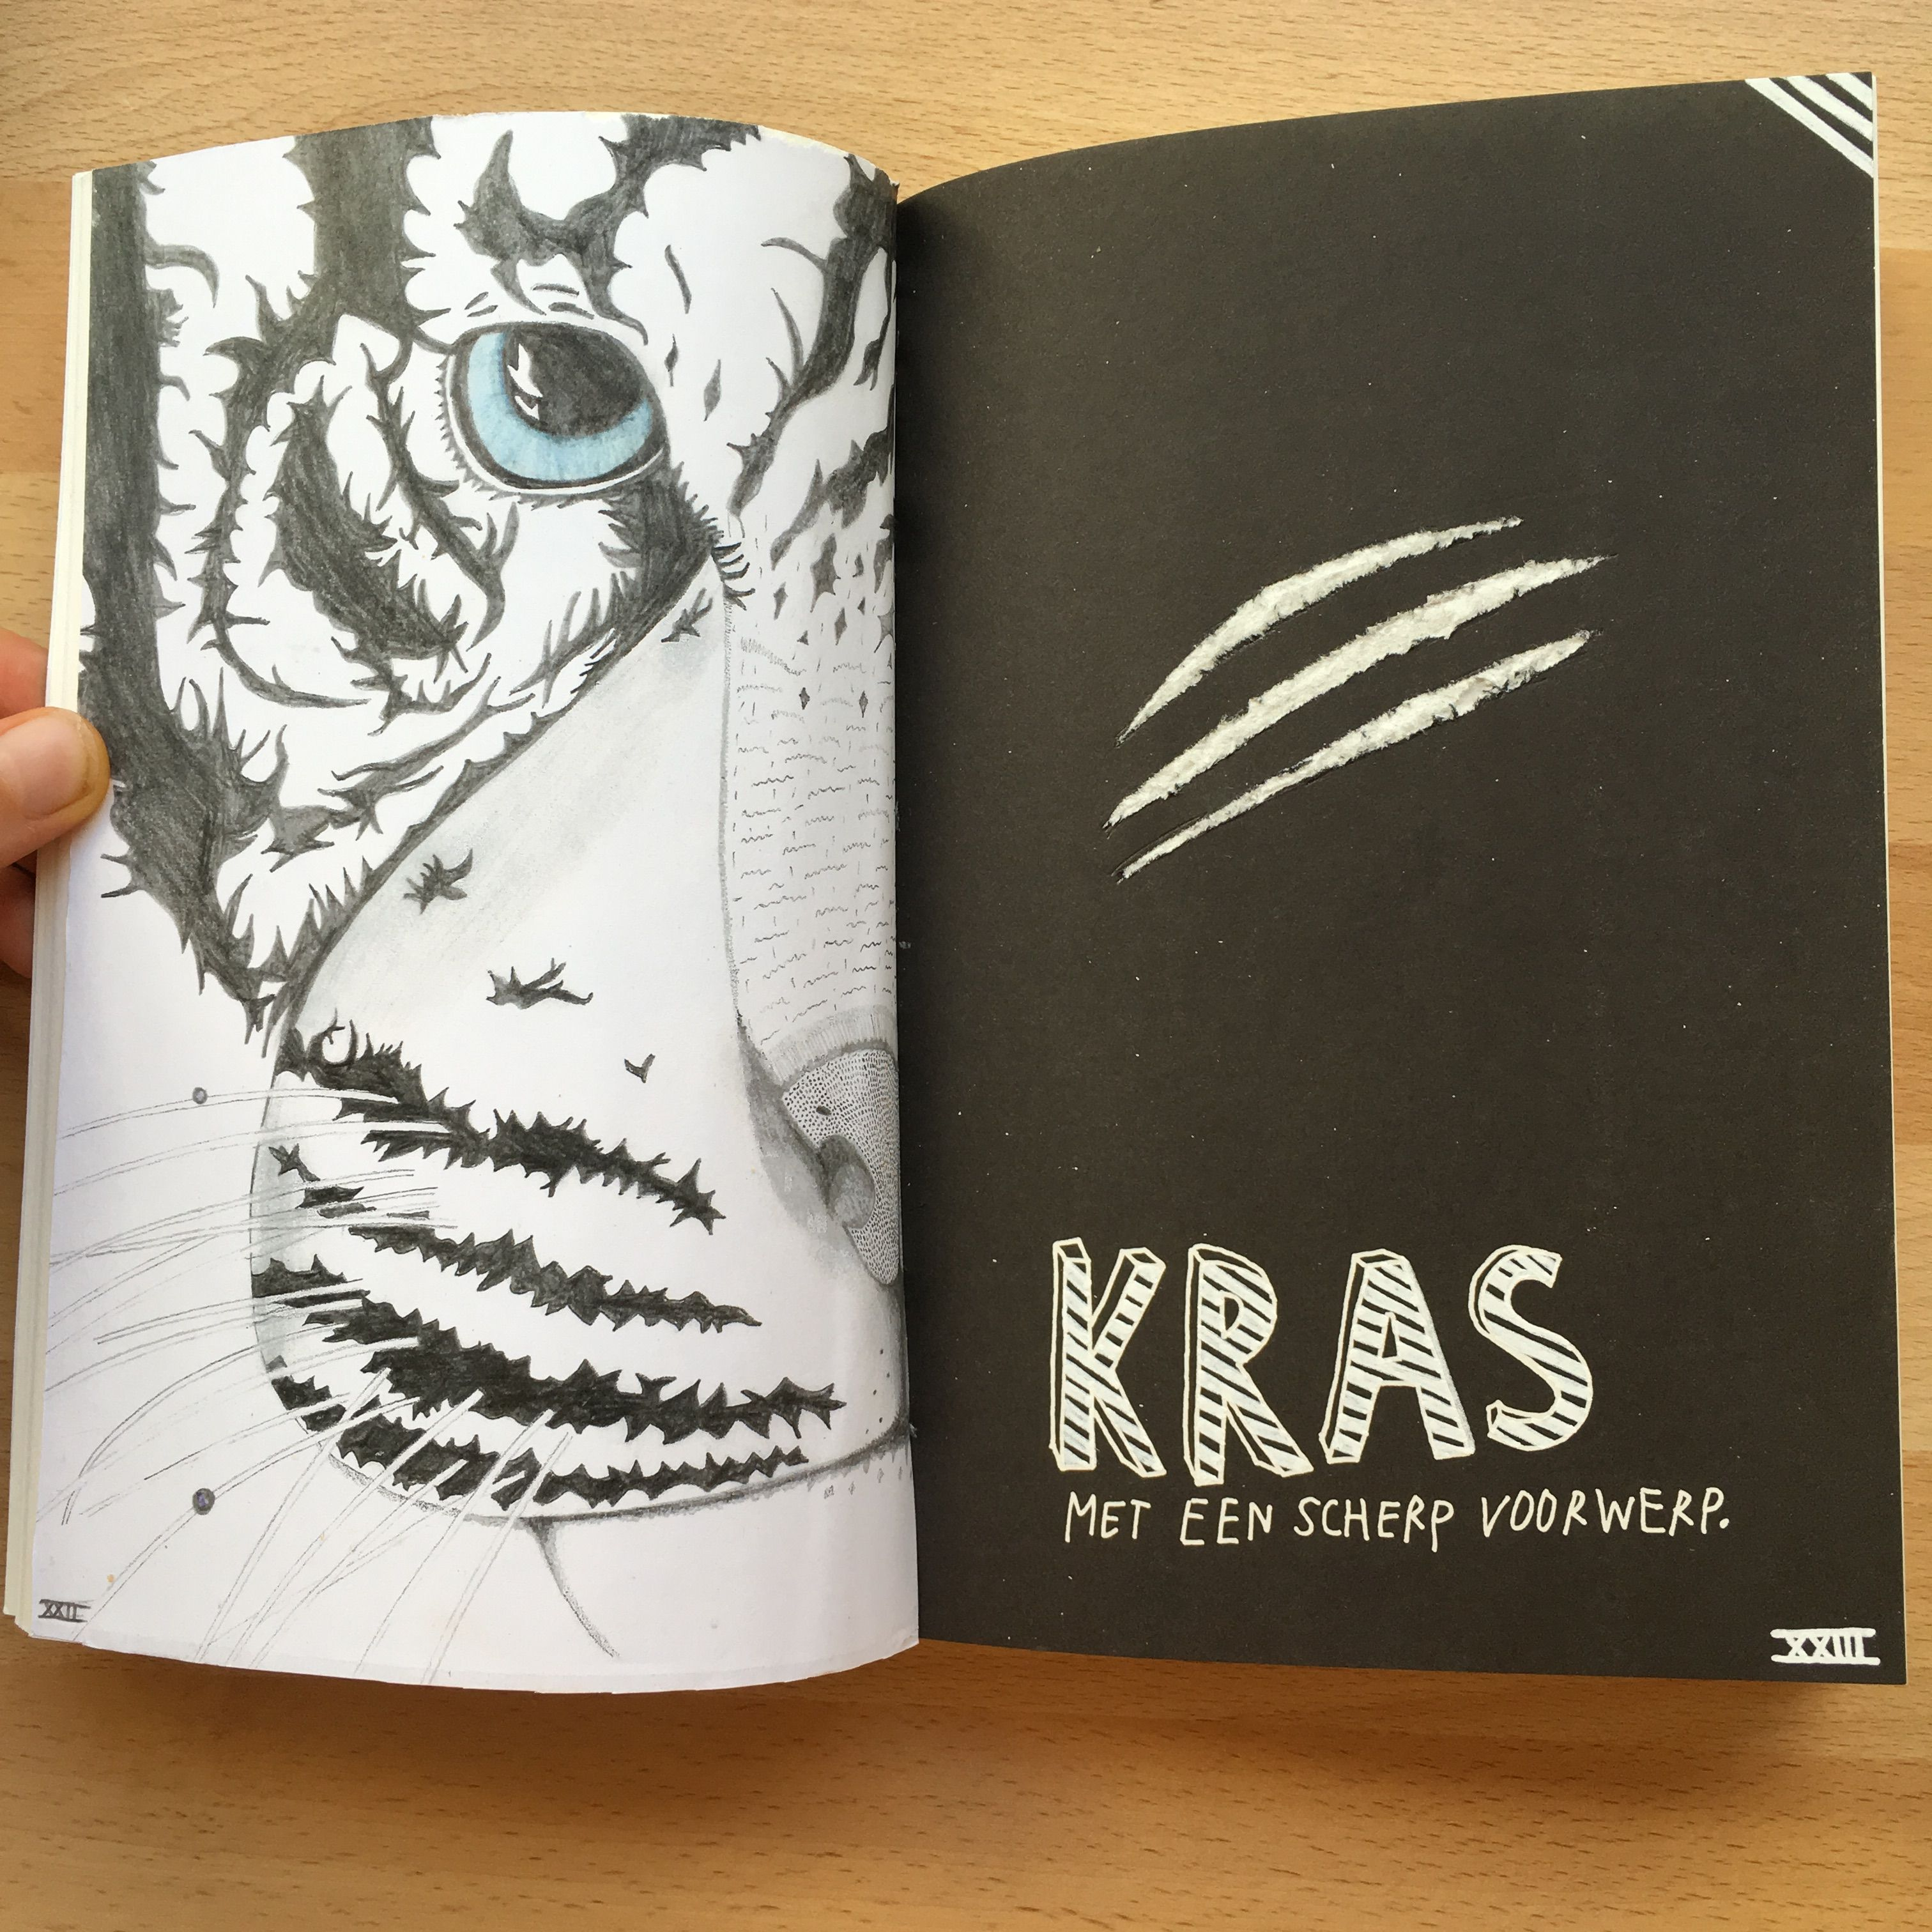 Wreck this journal scratch using a sharp object kras met een scherp voorwerp tiger tijger